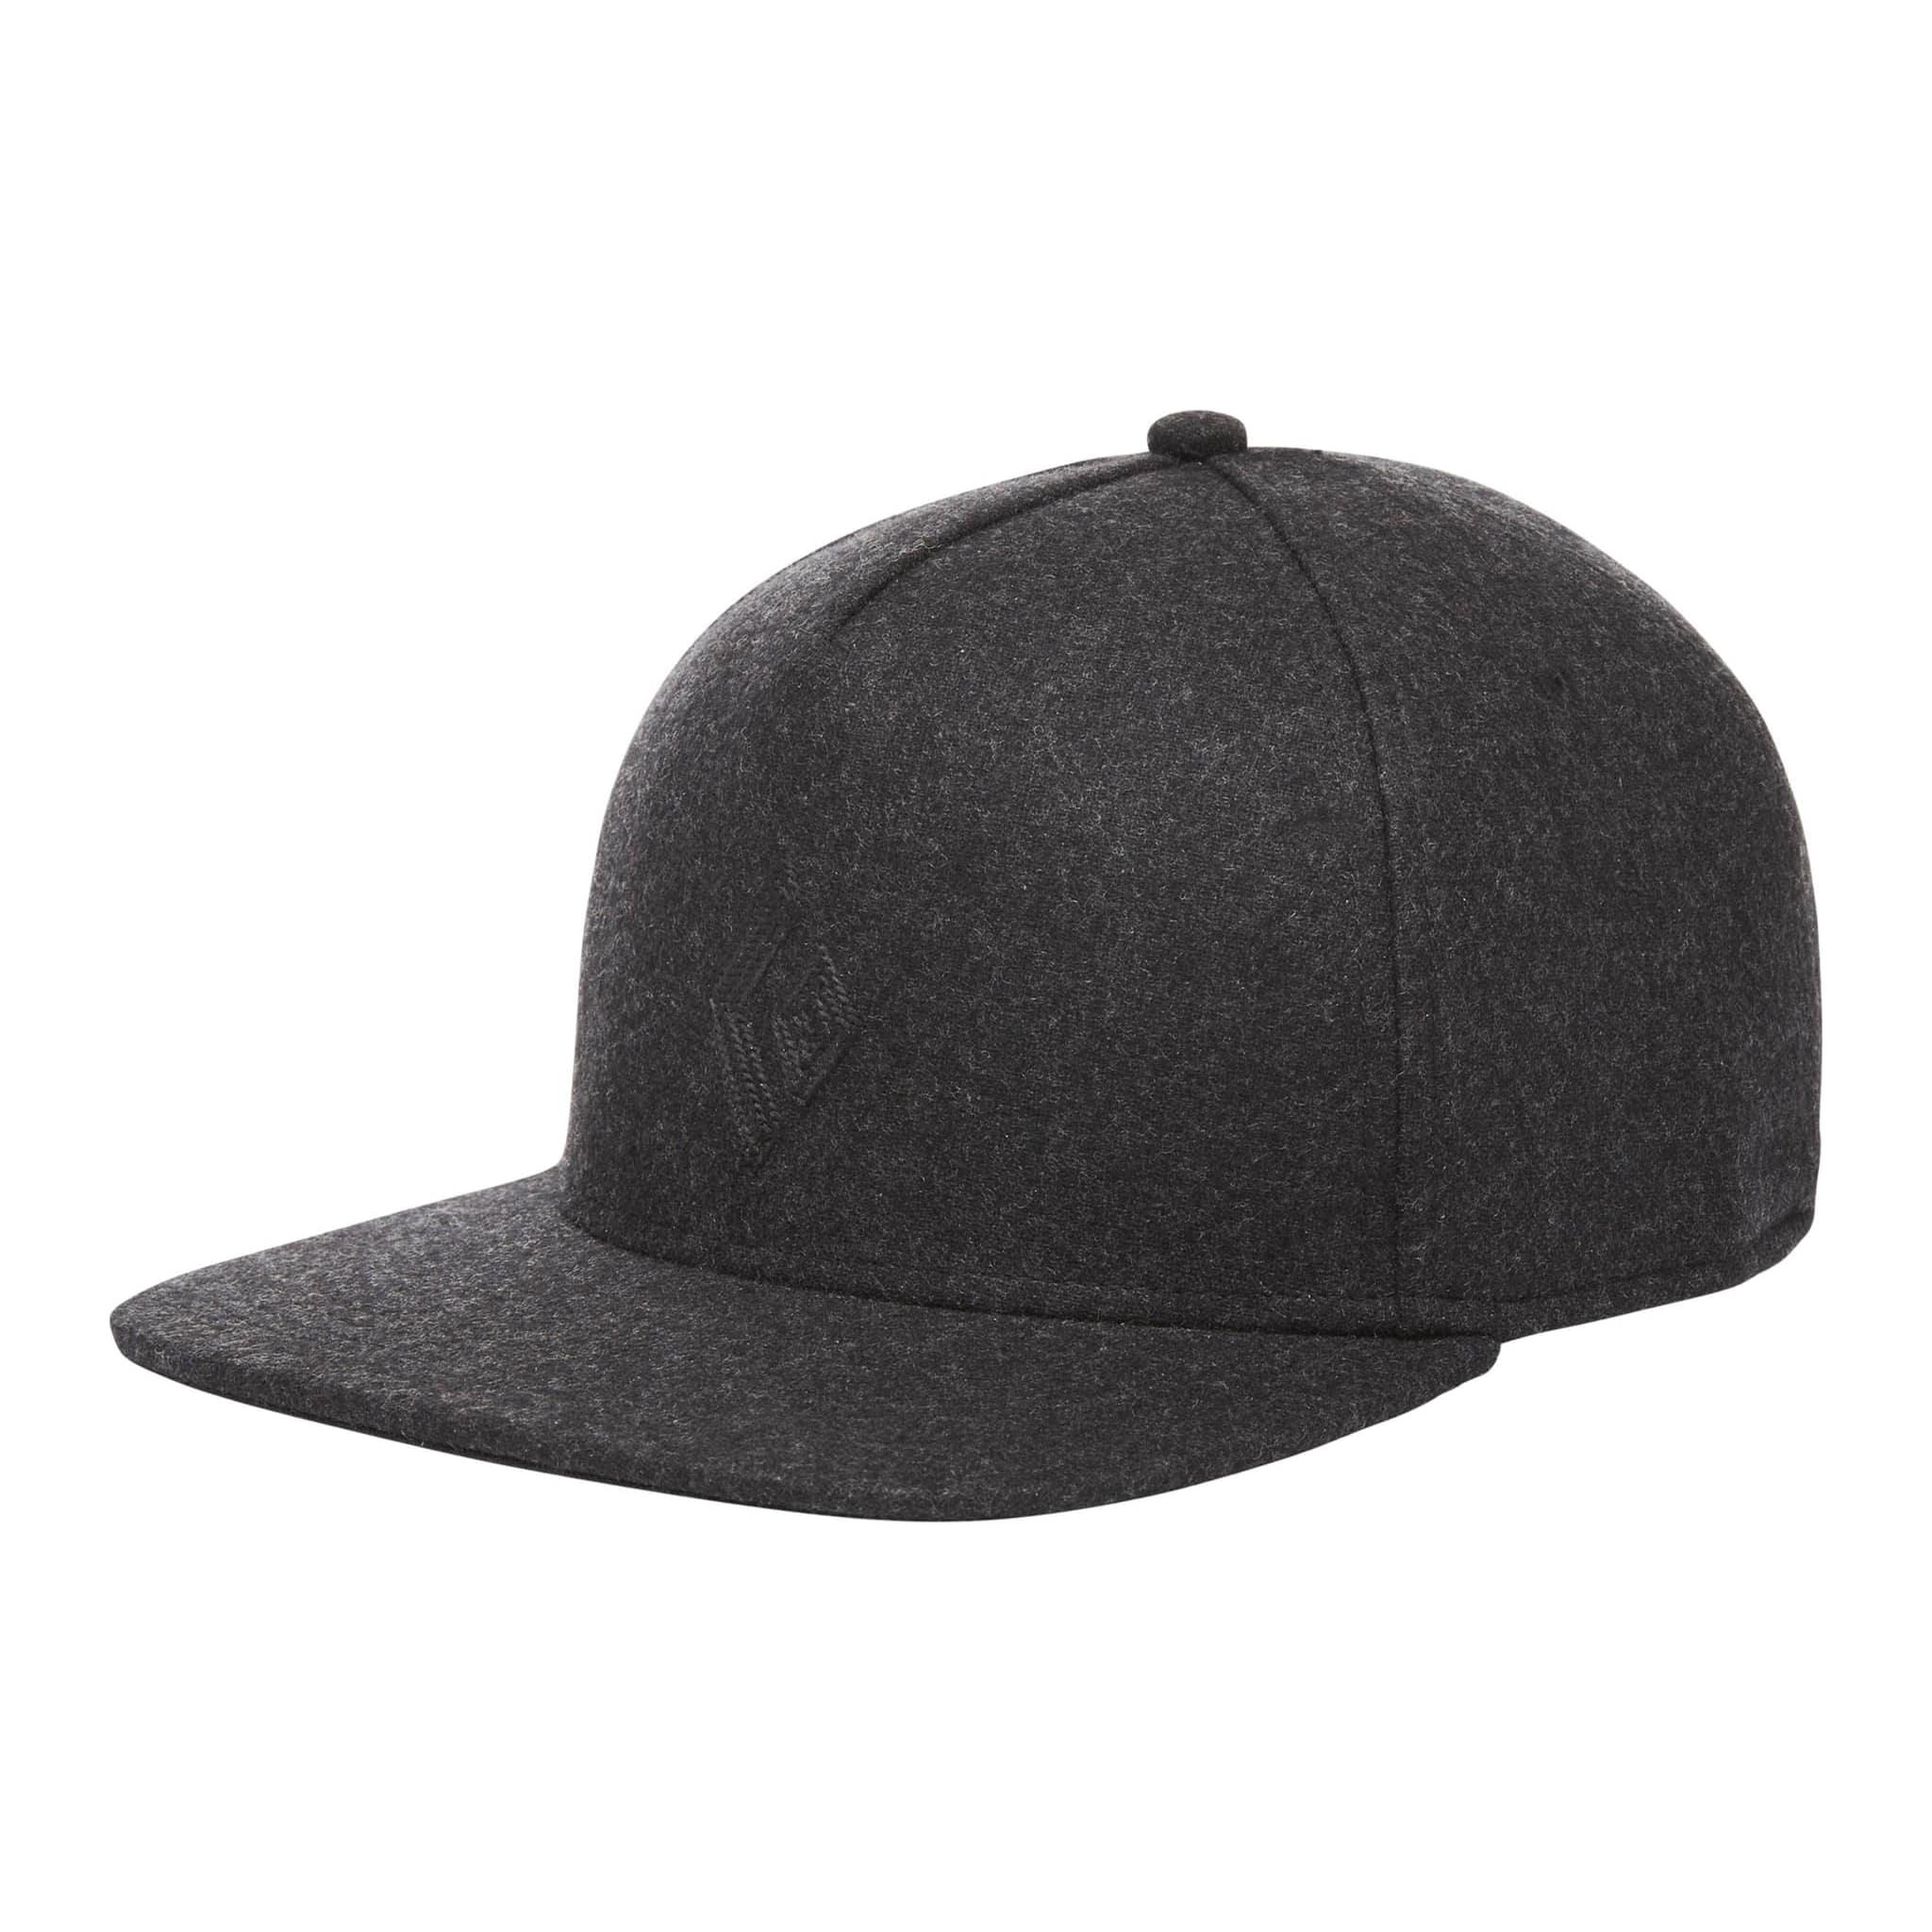 Komfortabel caps i ull